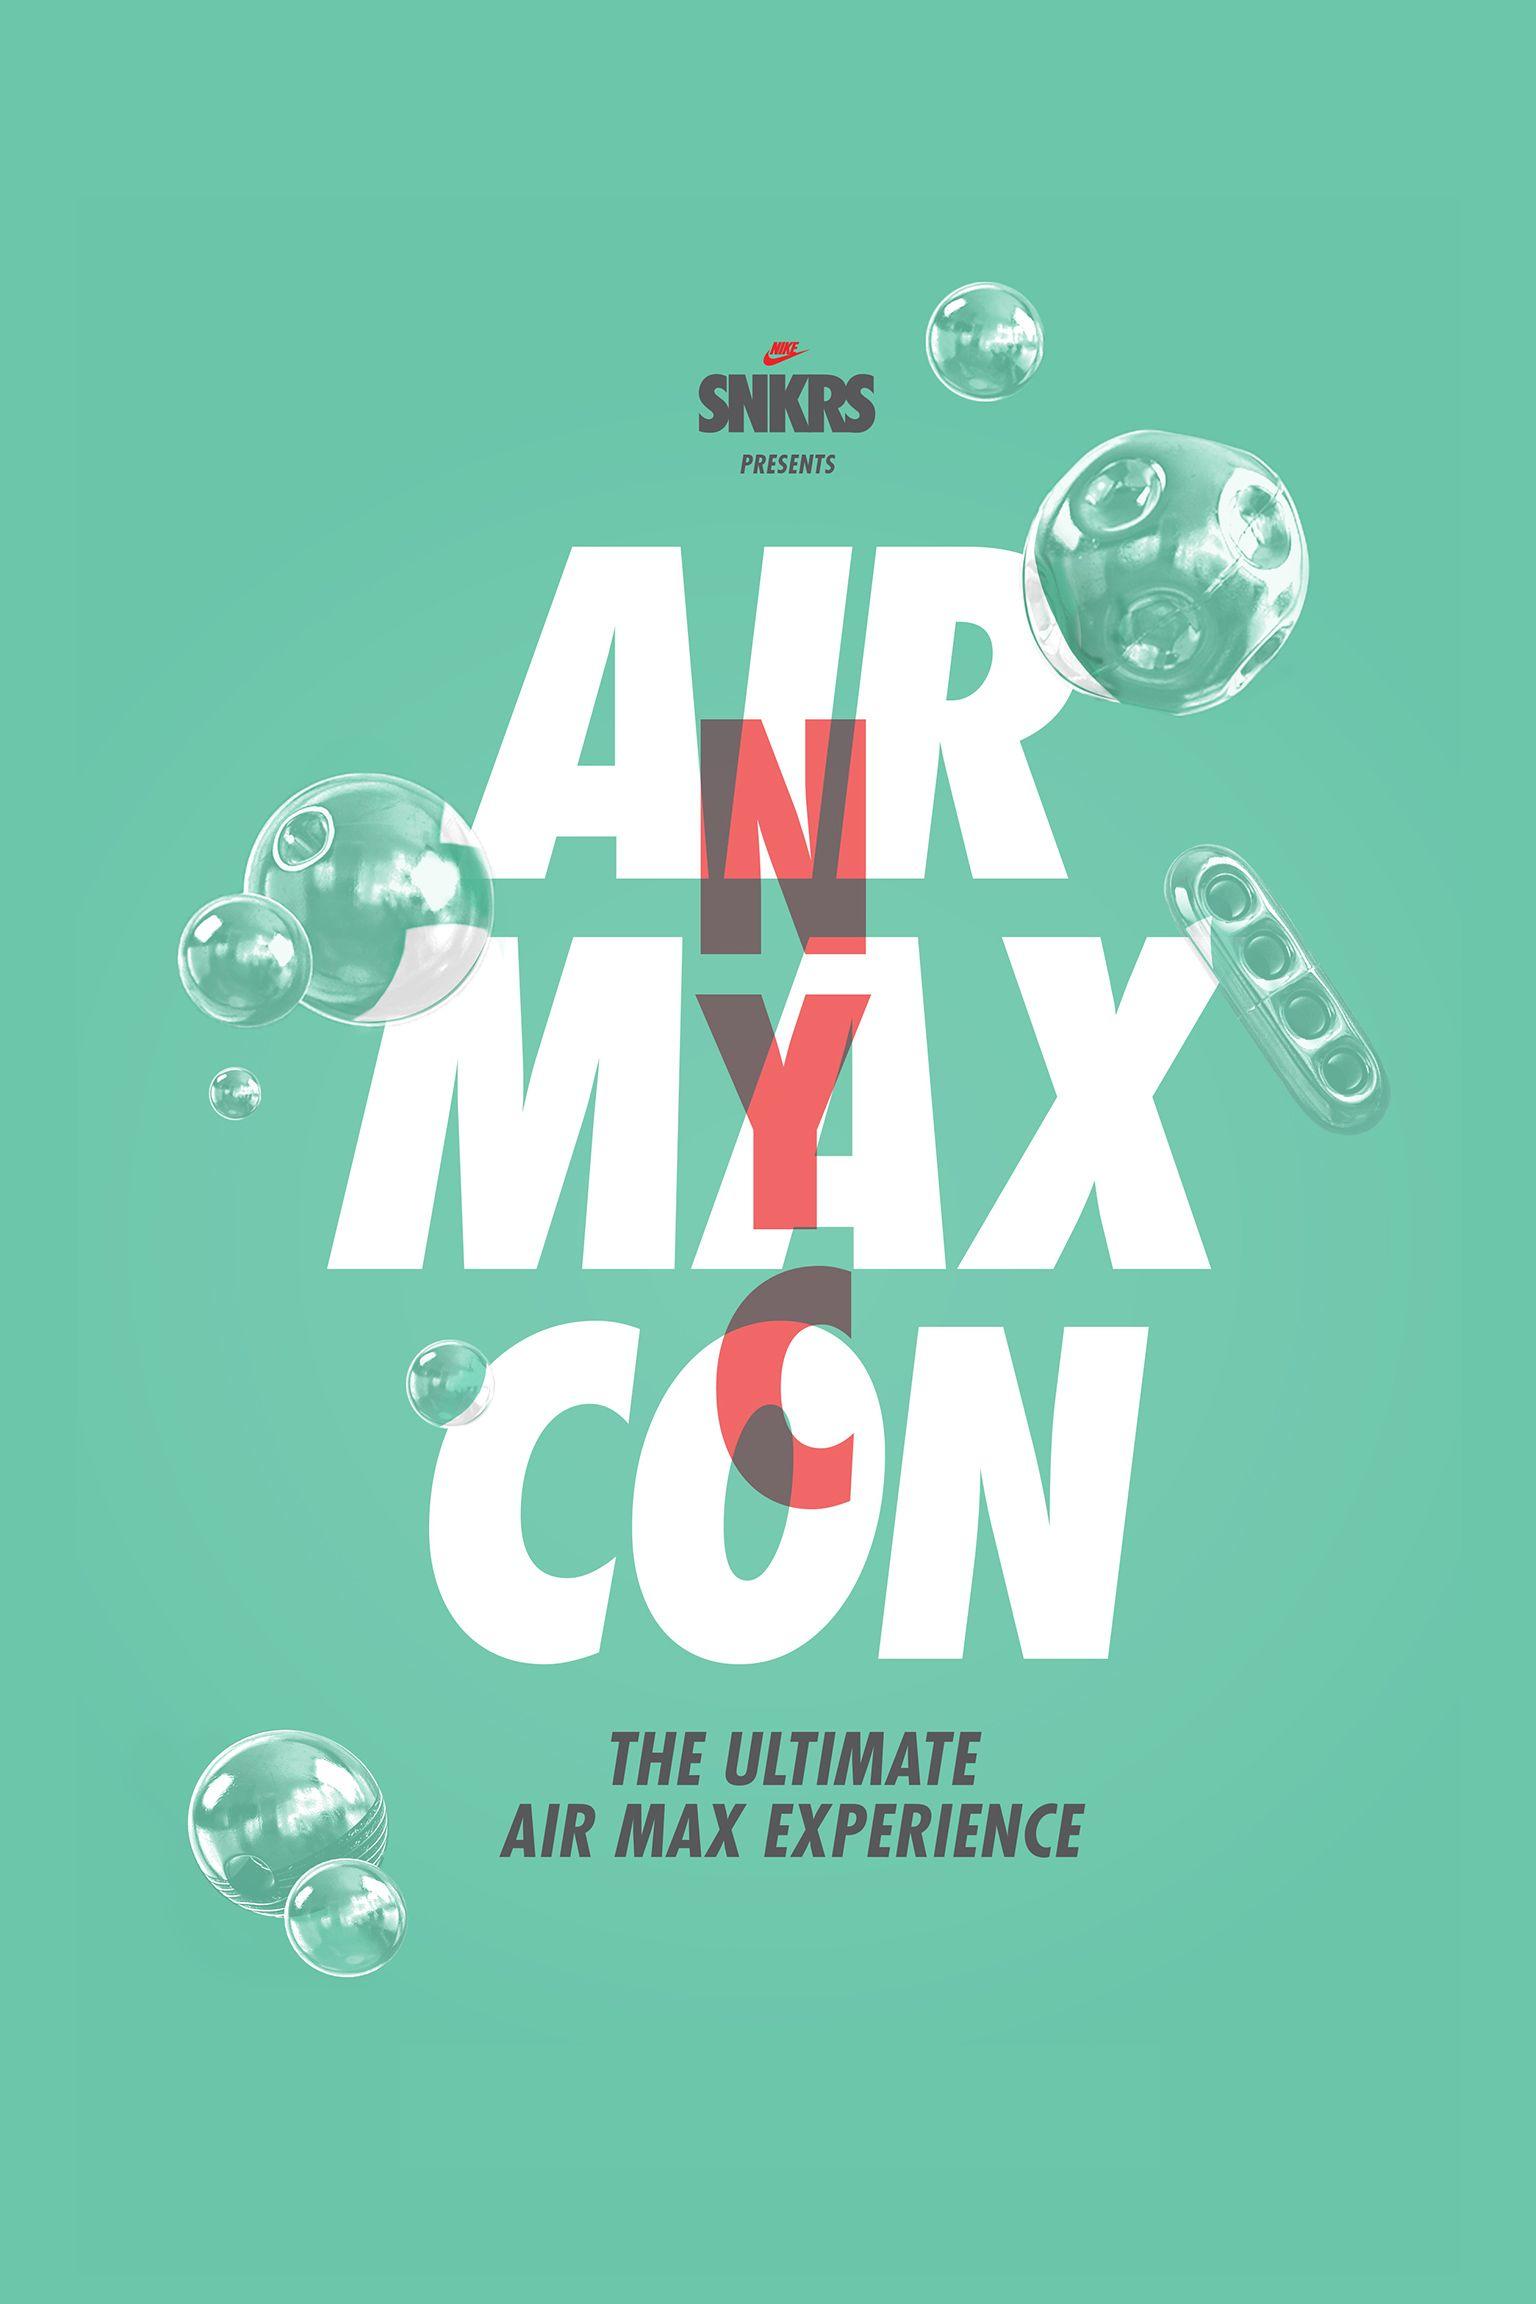 AIR MAX CON